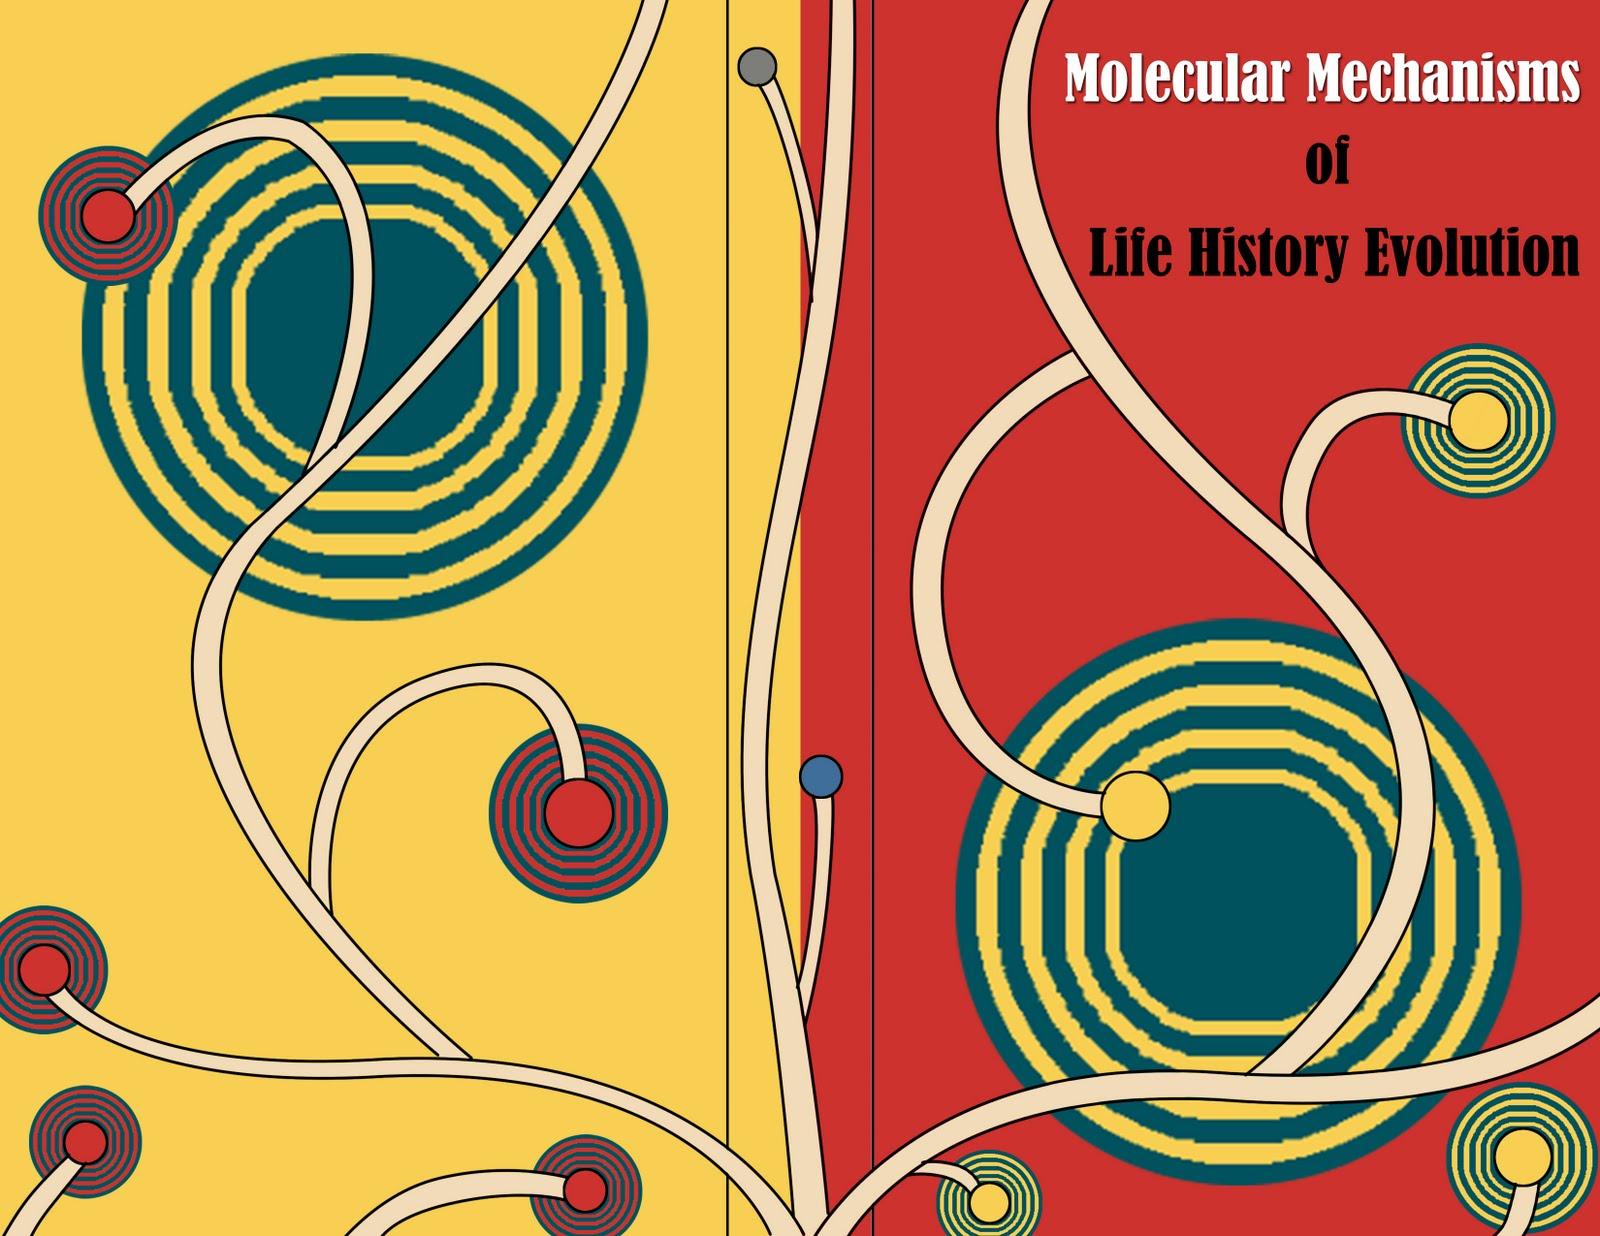 Book Cover Illustration Composition ~ Mmurcia d design book cover composition